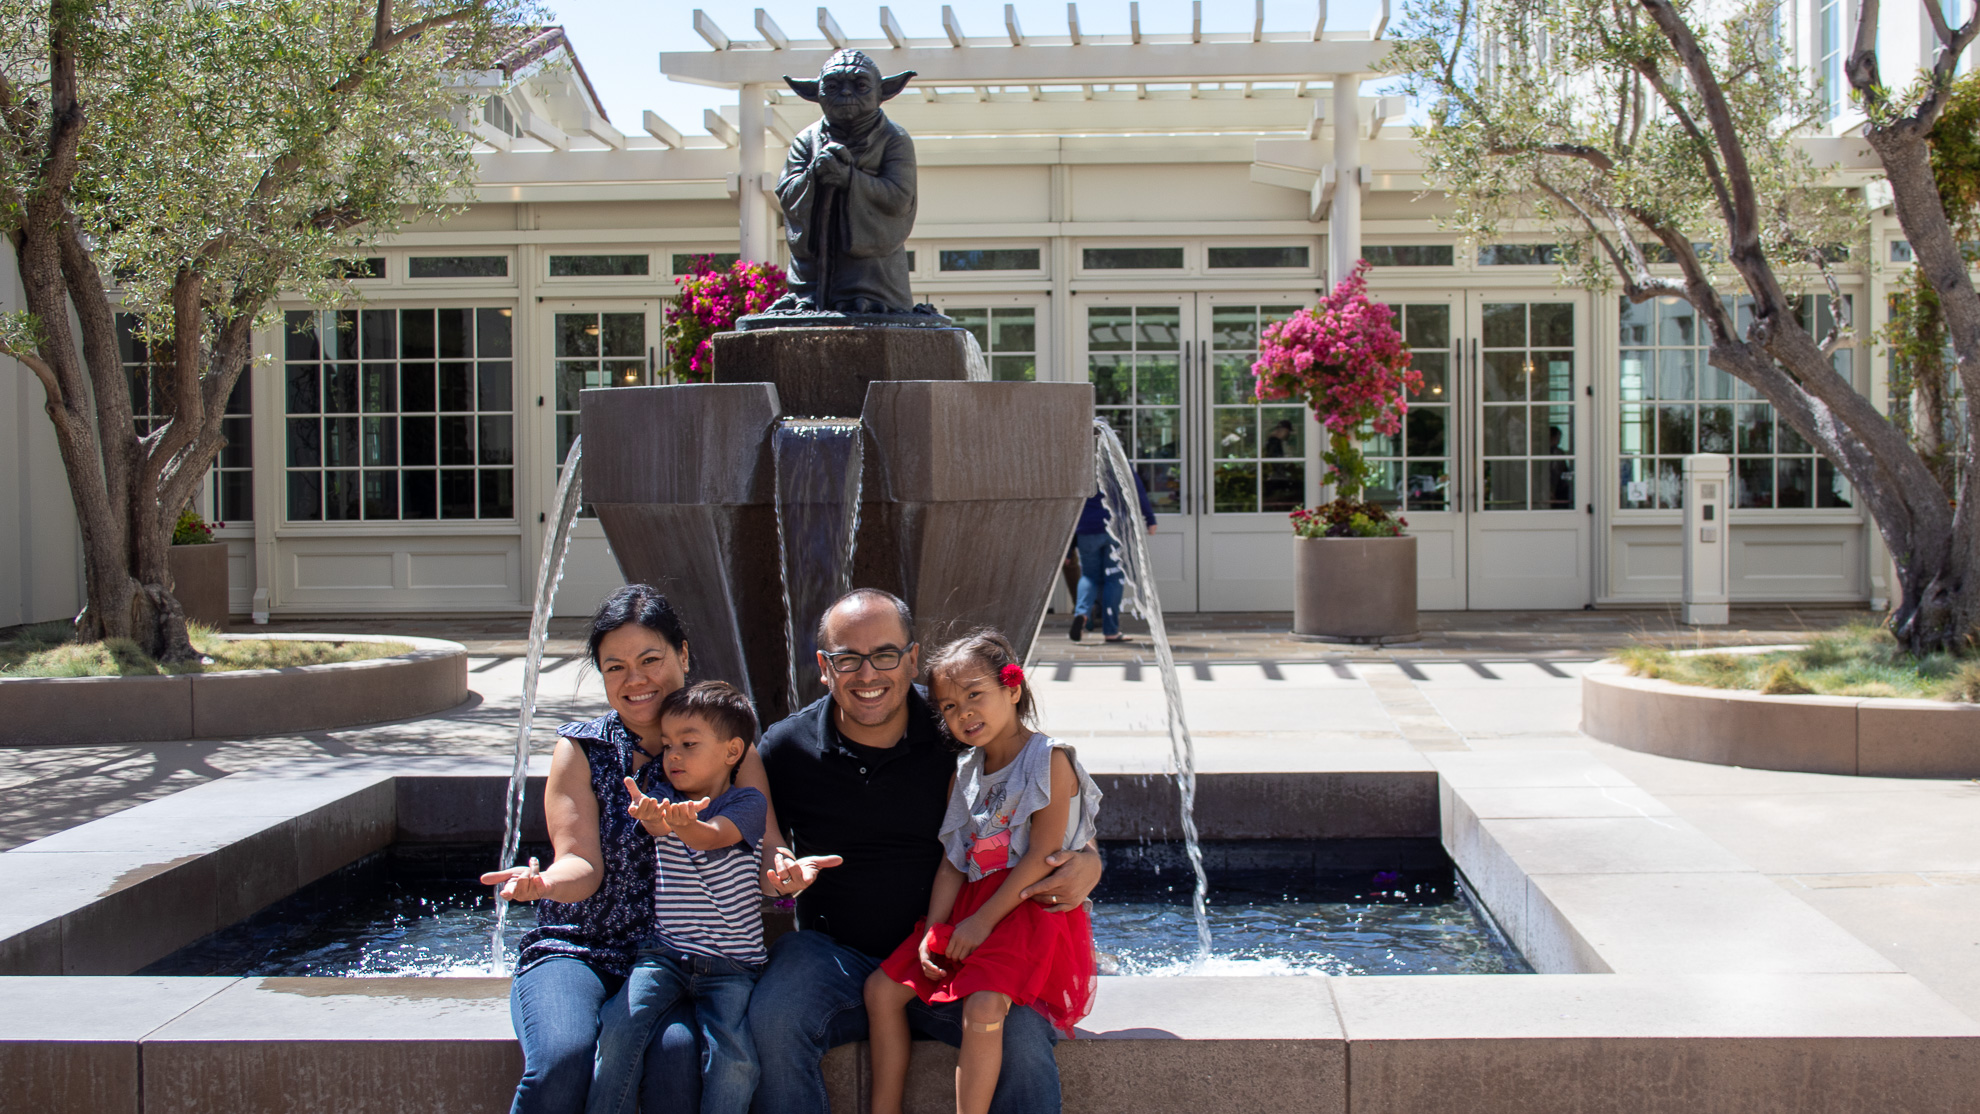 Oscar Gonzalez and family posing next to the Yoda water fountain.